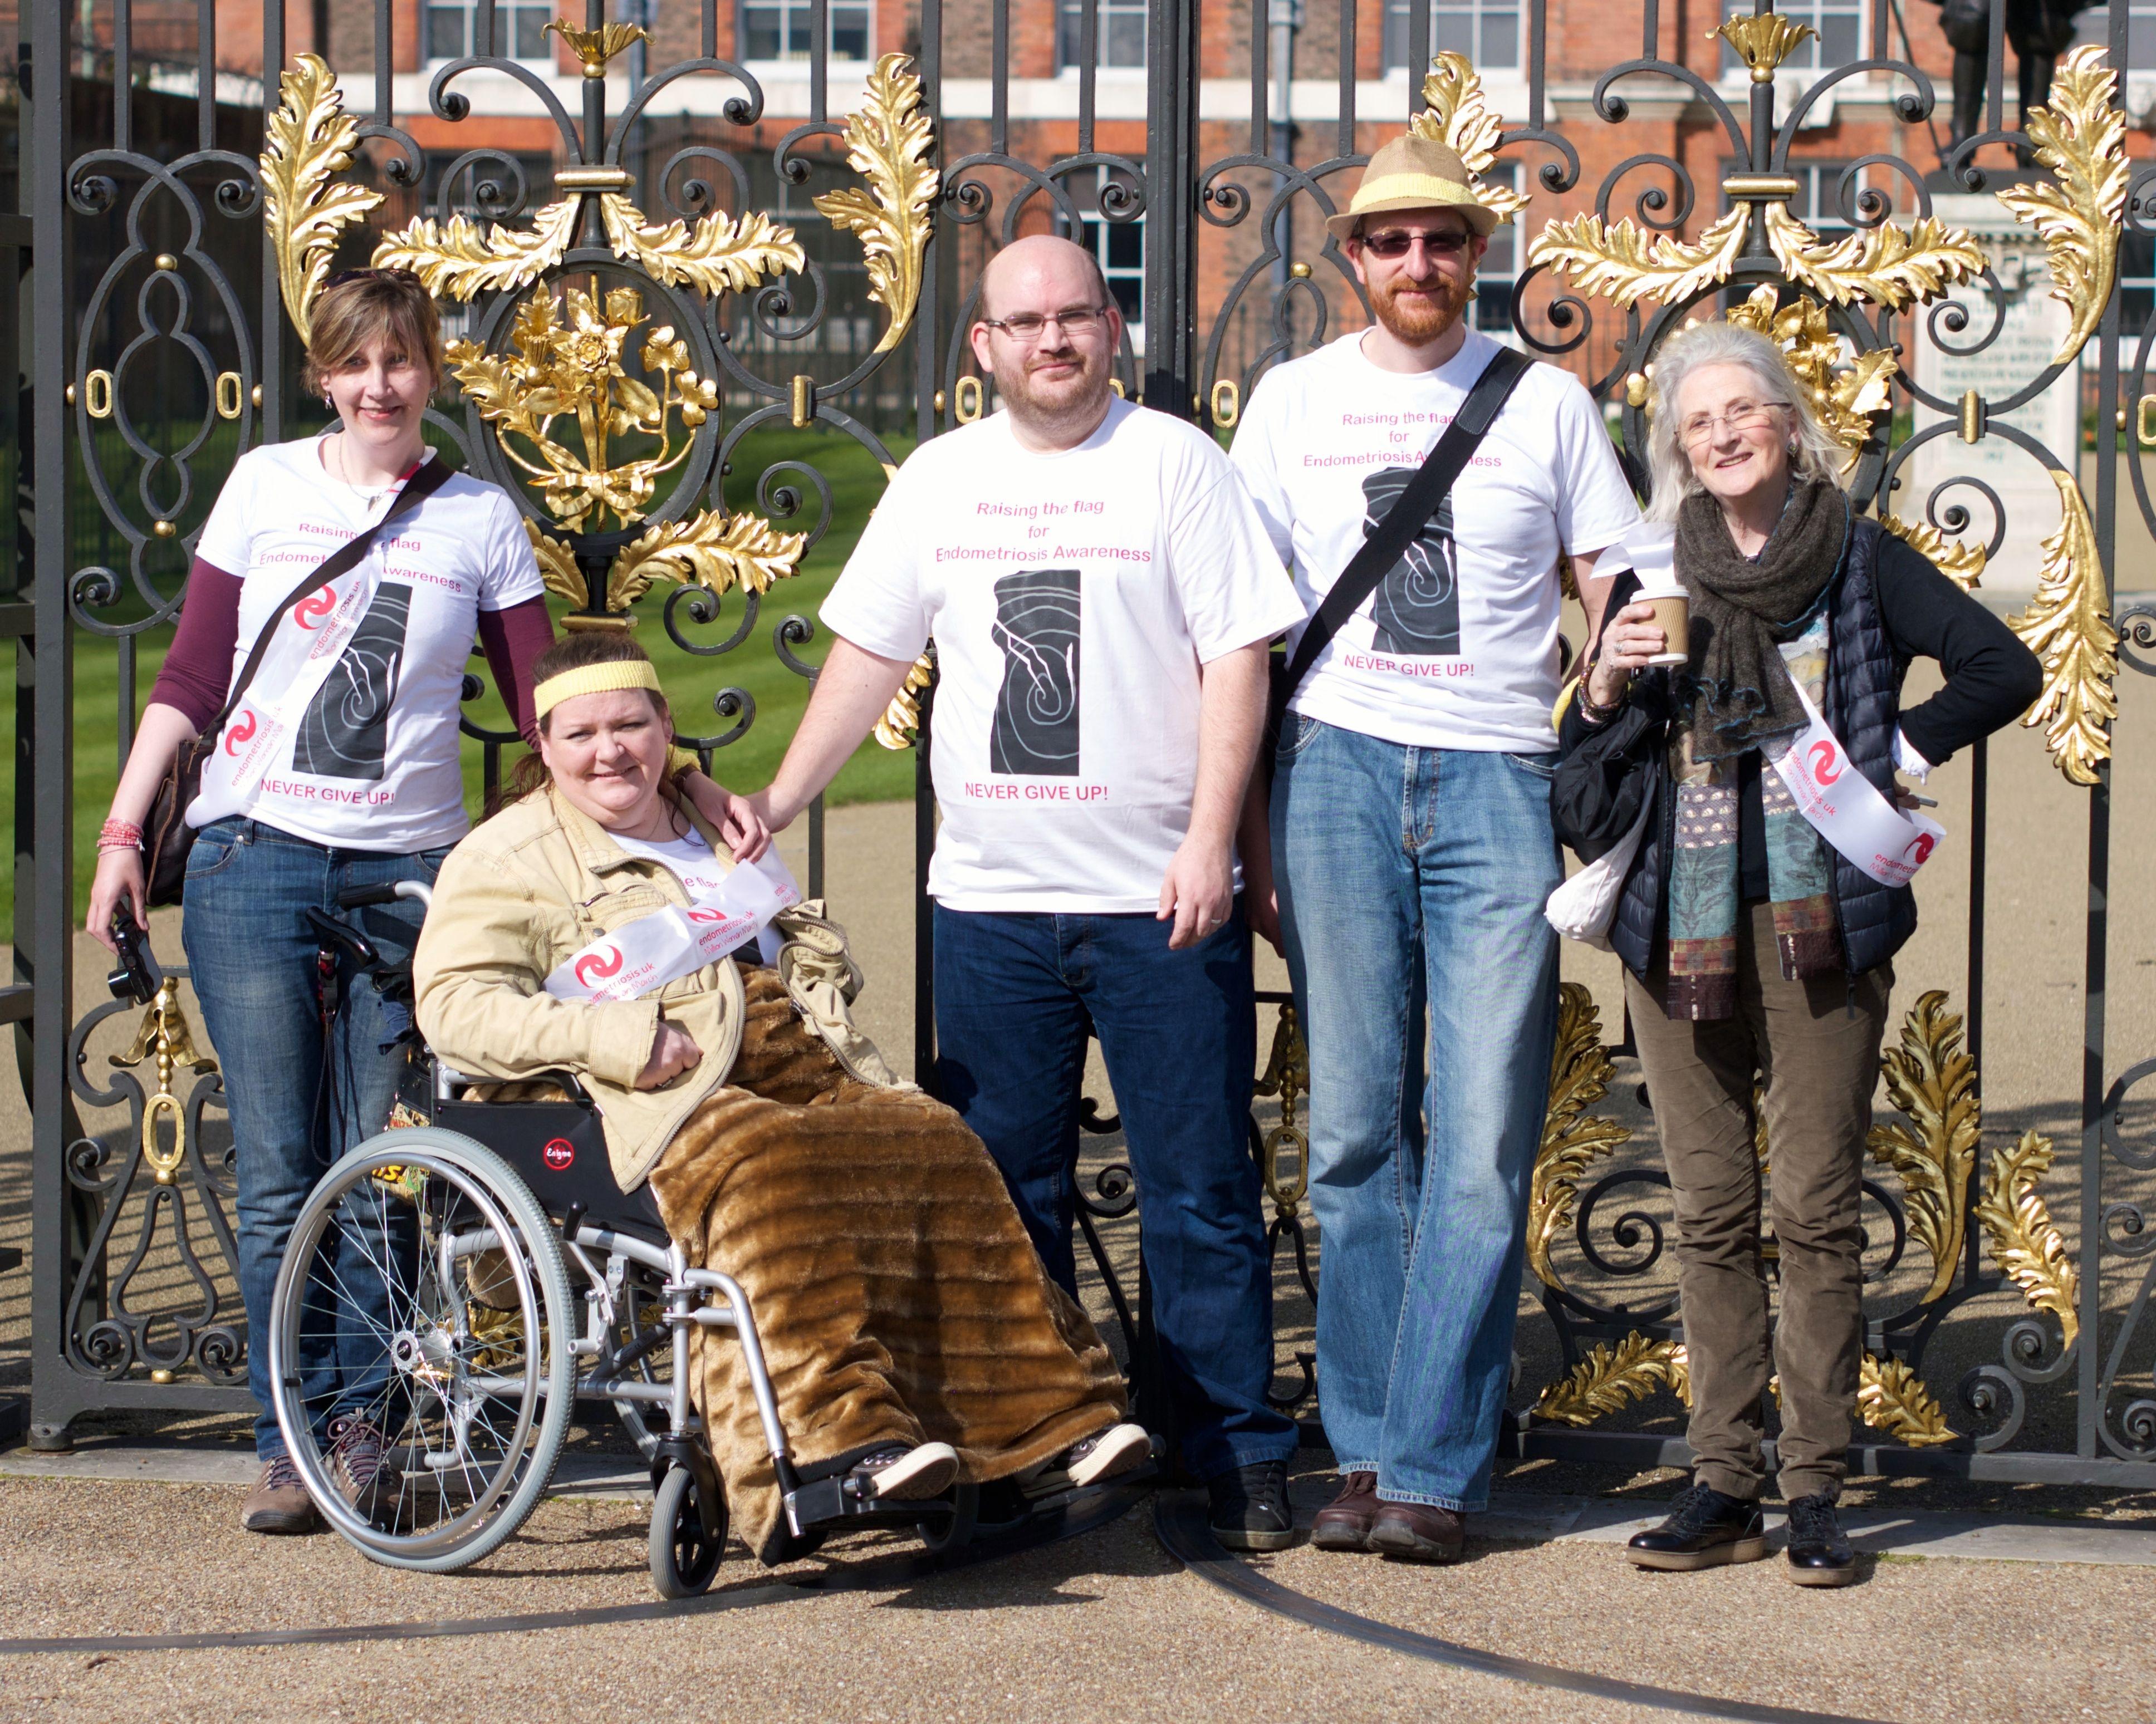 Antonia Boyton, Rachel Duffield, Keith Duffield, Lee Boyton and Tess Blondel all walking for Endometriosis Awareness